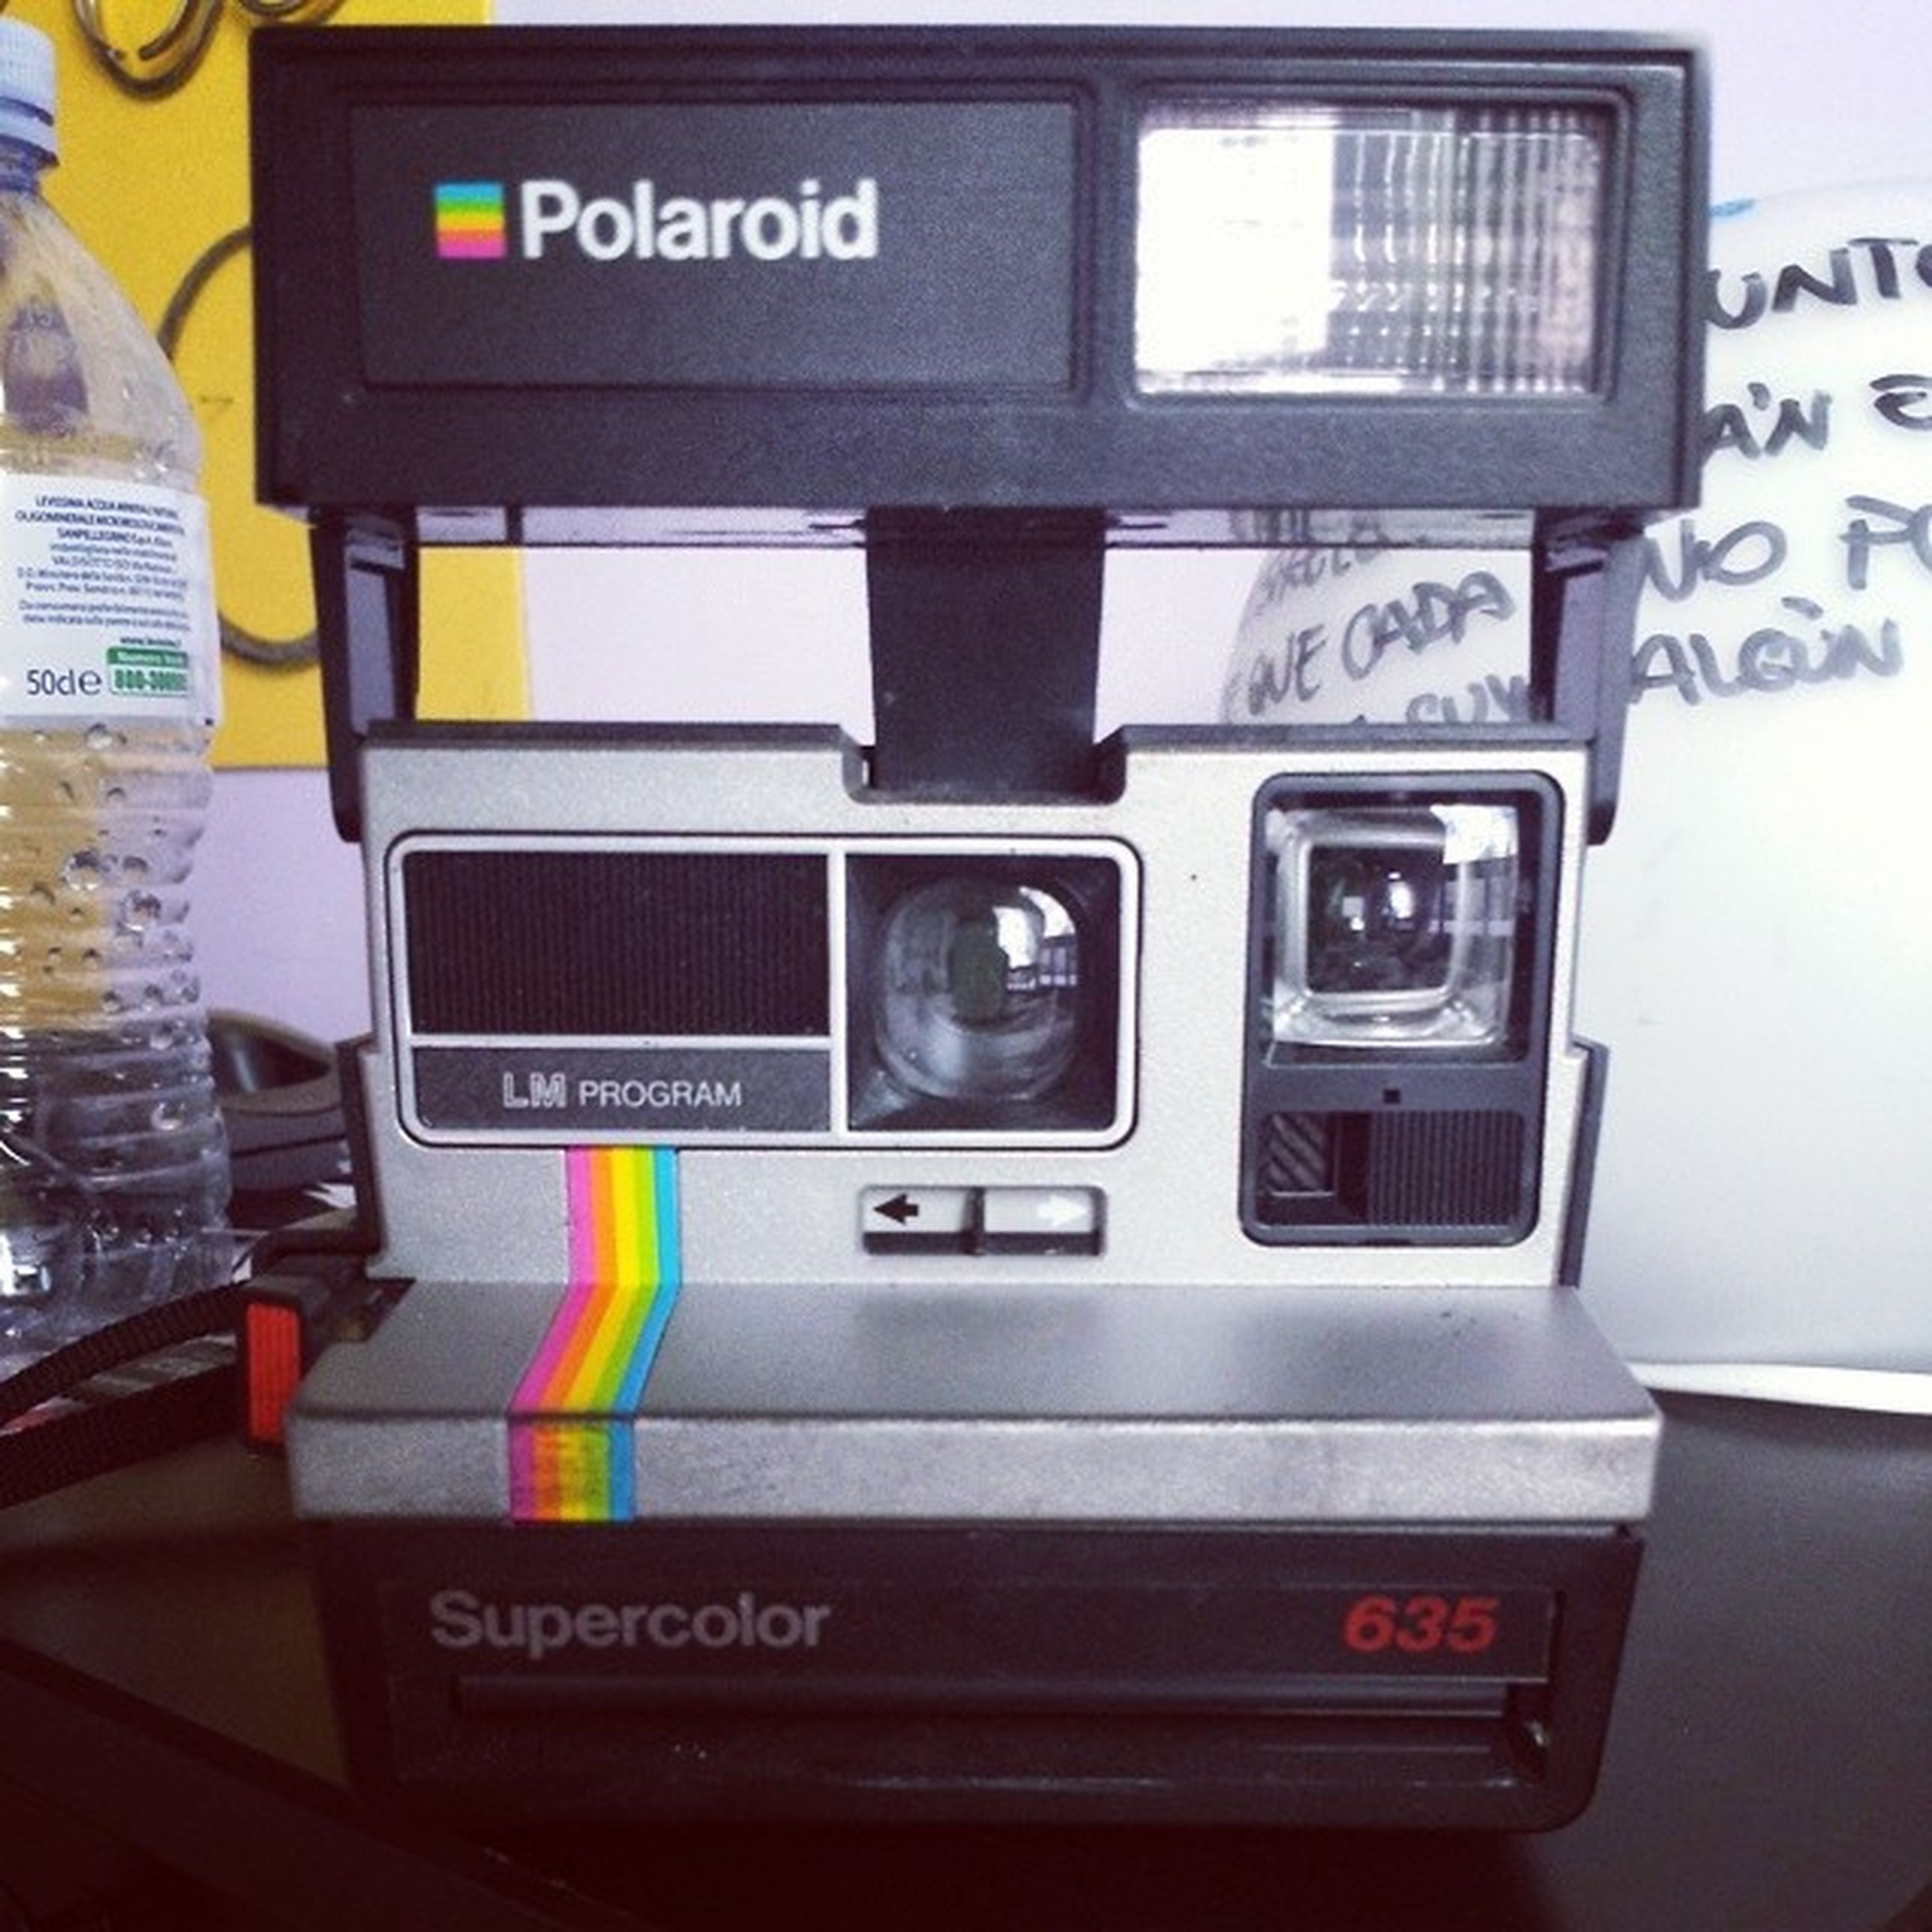 Nacifravintageao Nice Manoneunamacchinetta ! Polaroid